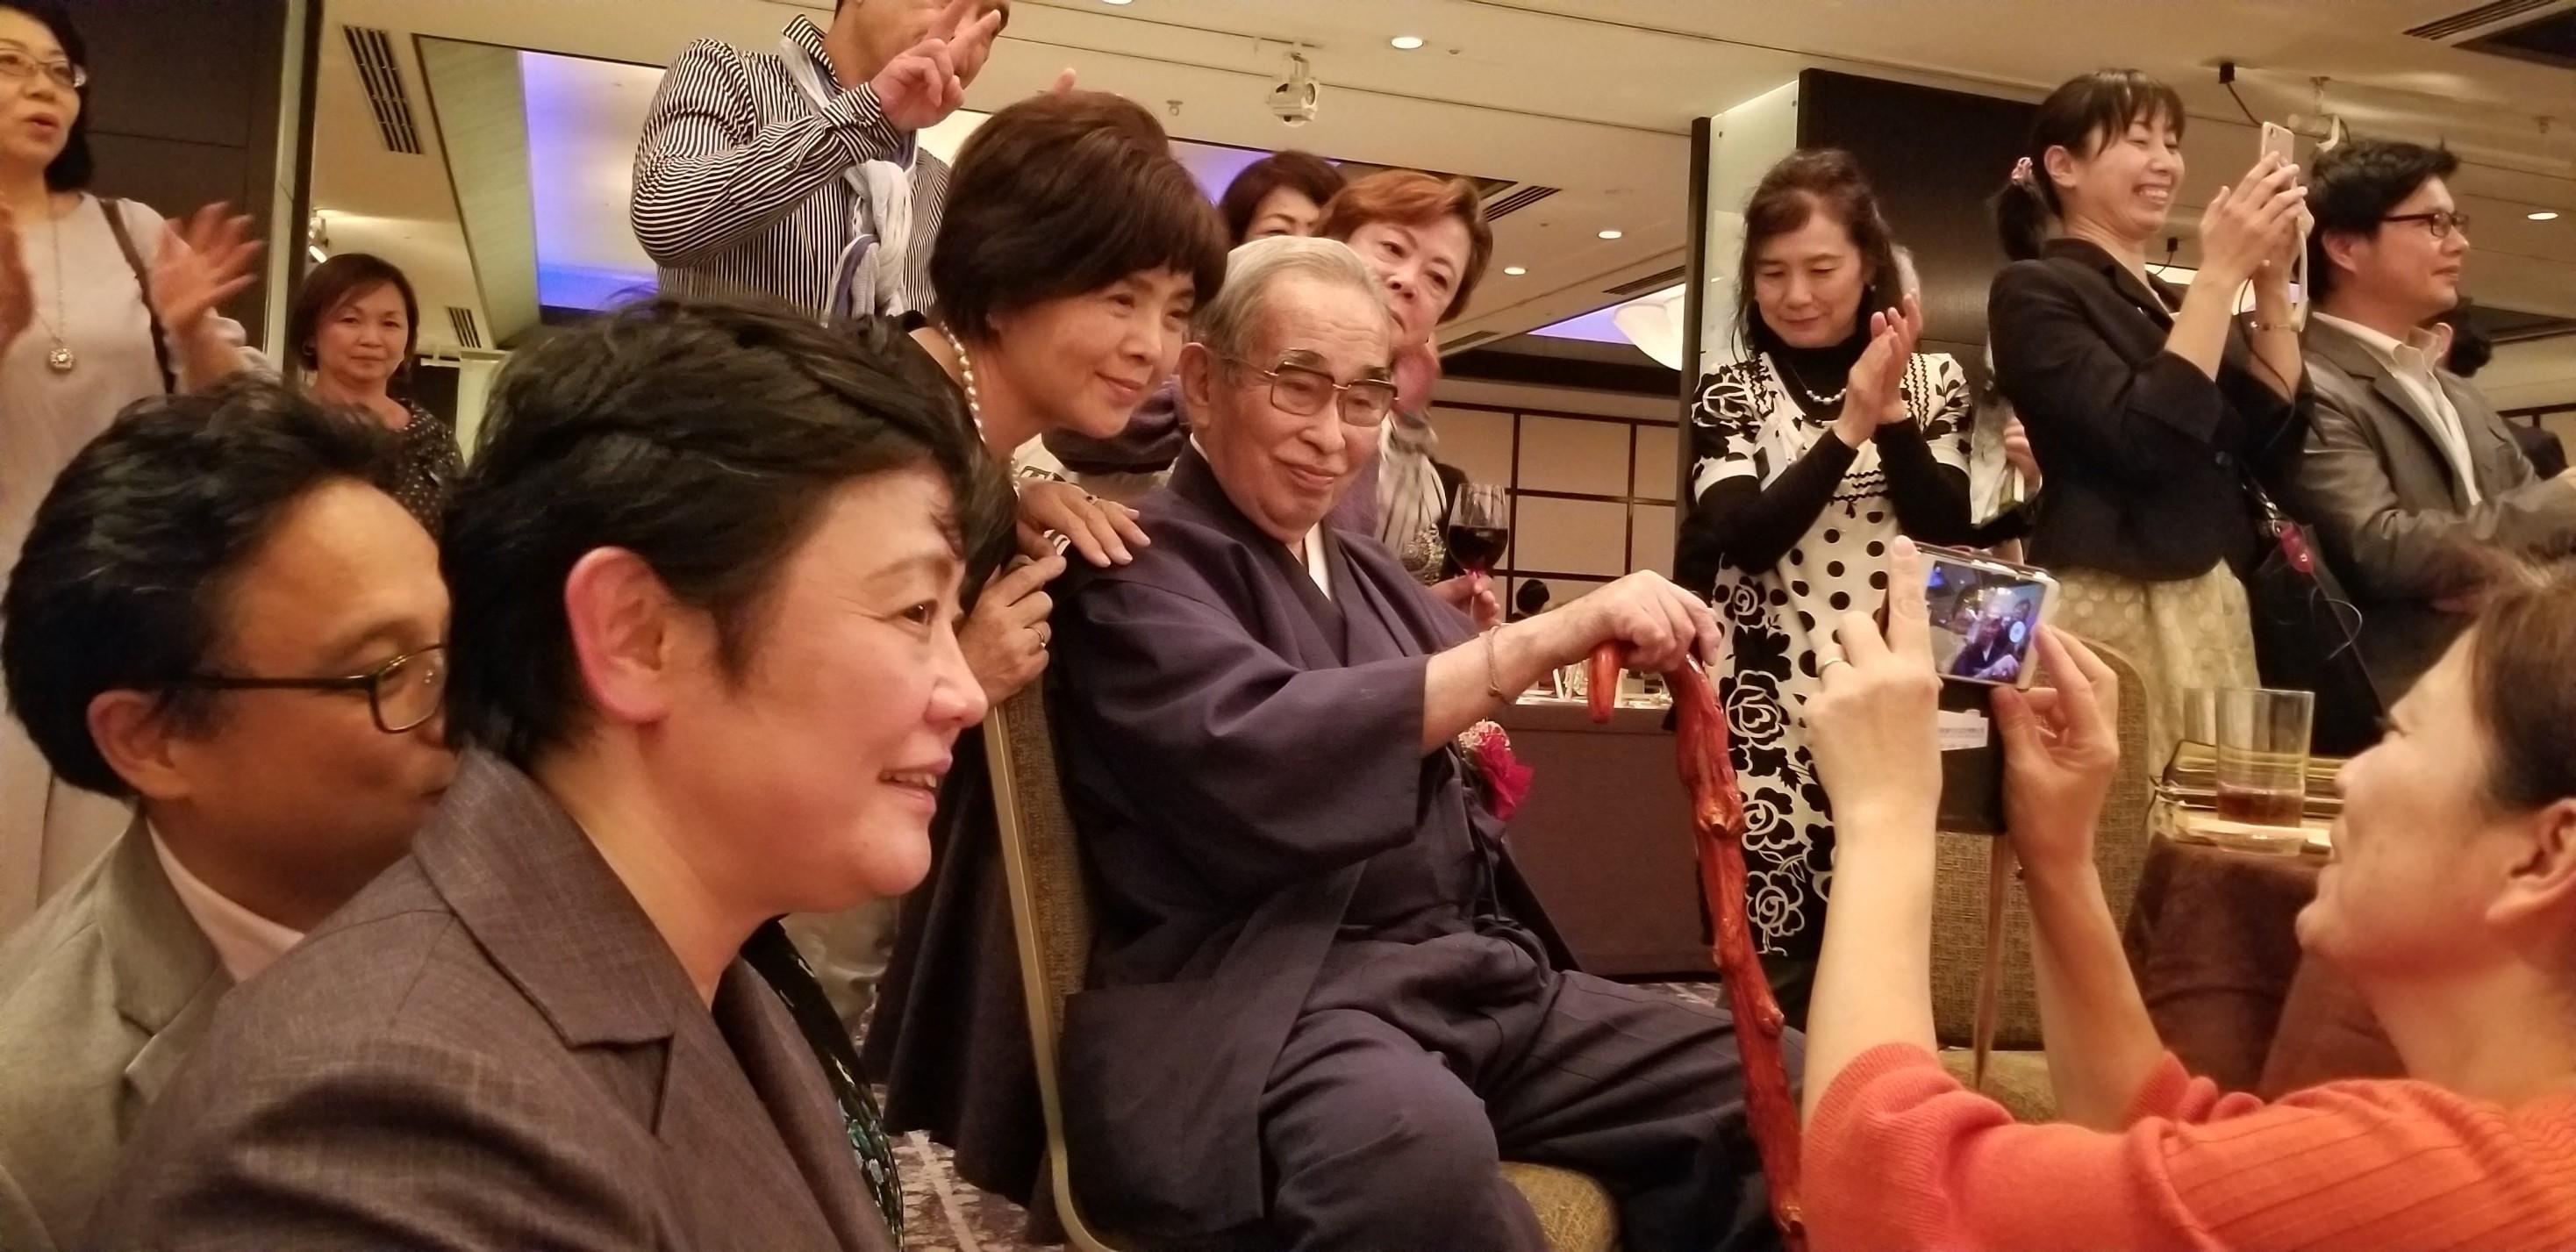 669d2960a1b3bd7459790371a34b1b4f - 第6回思風会全国大会2018in東京開催